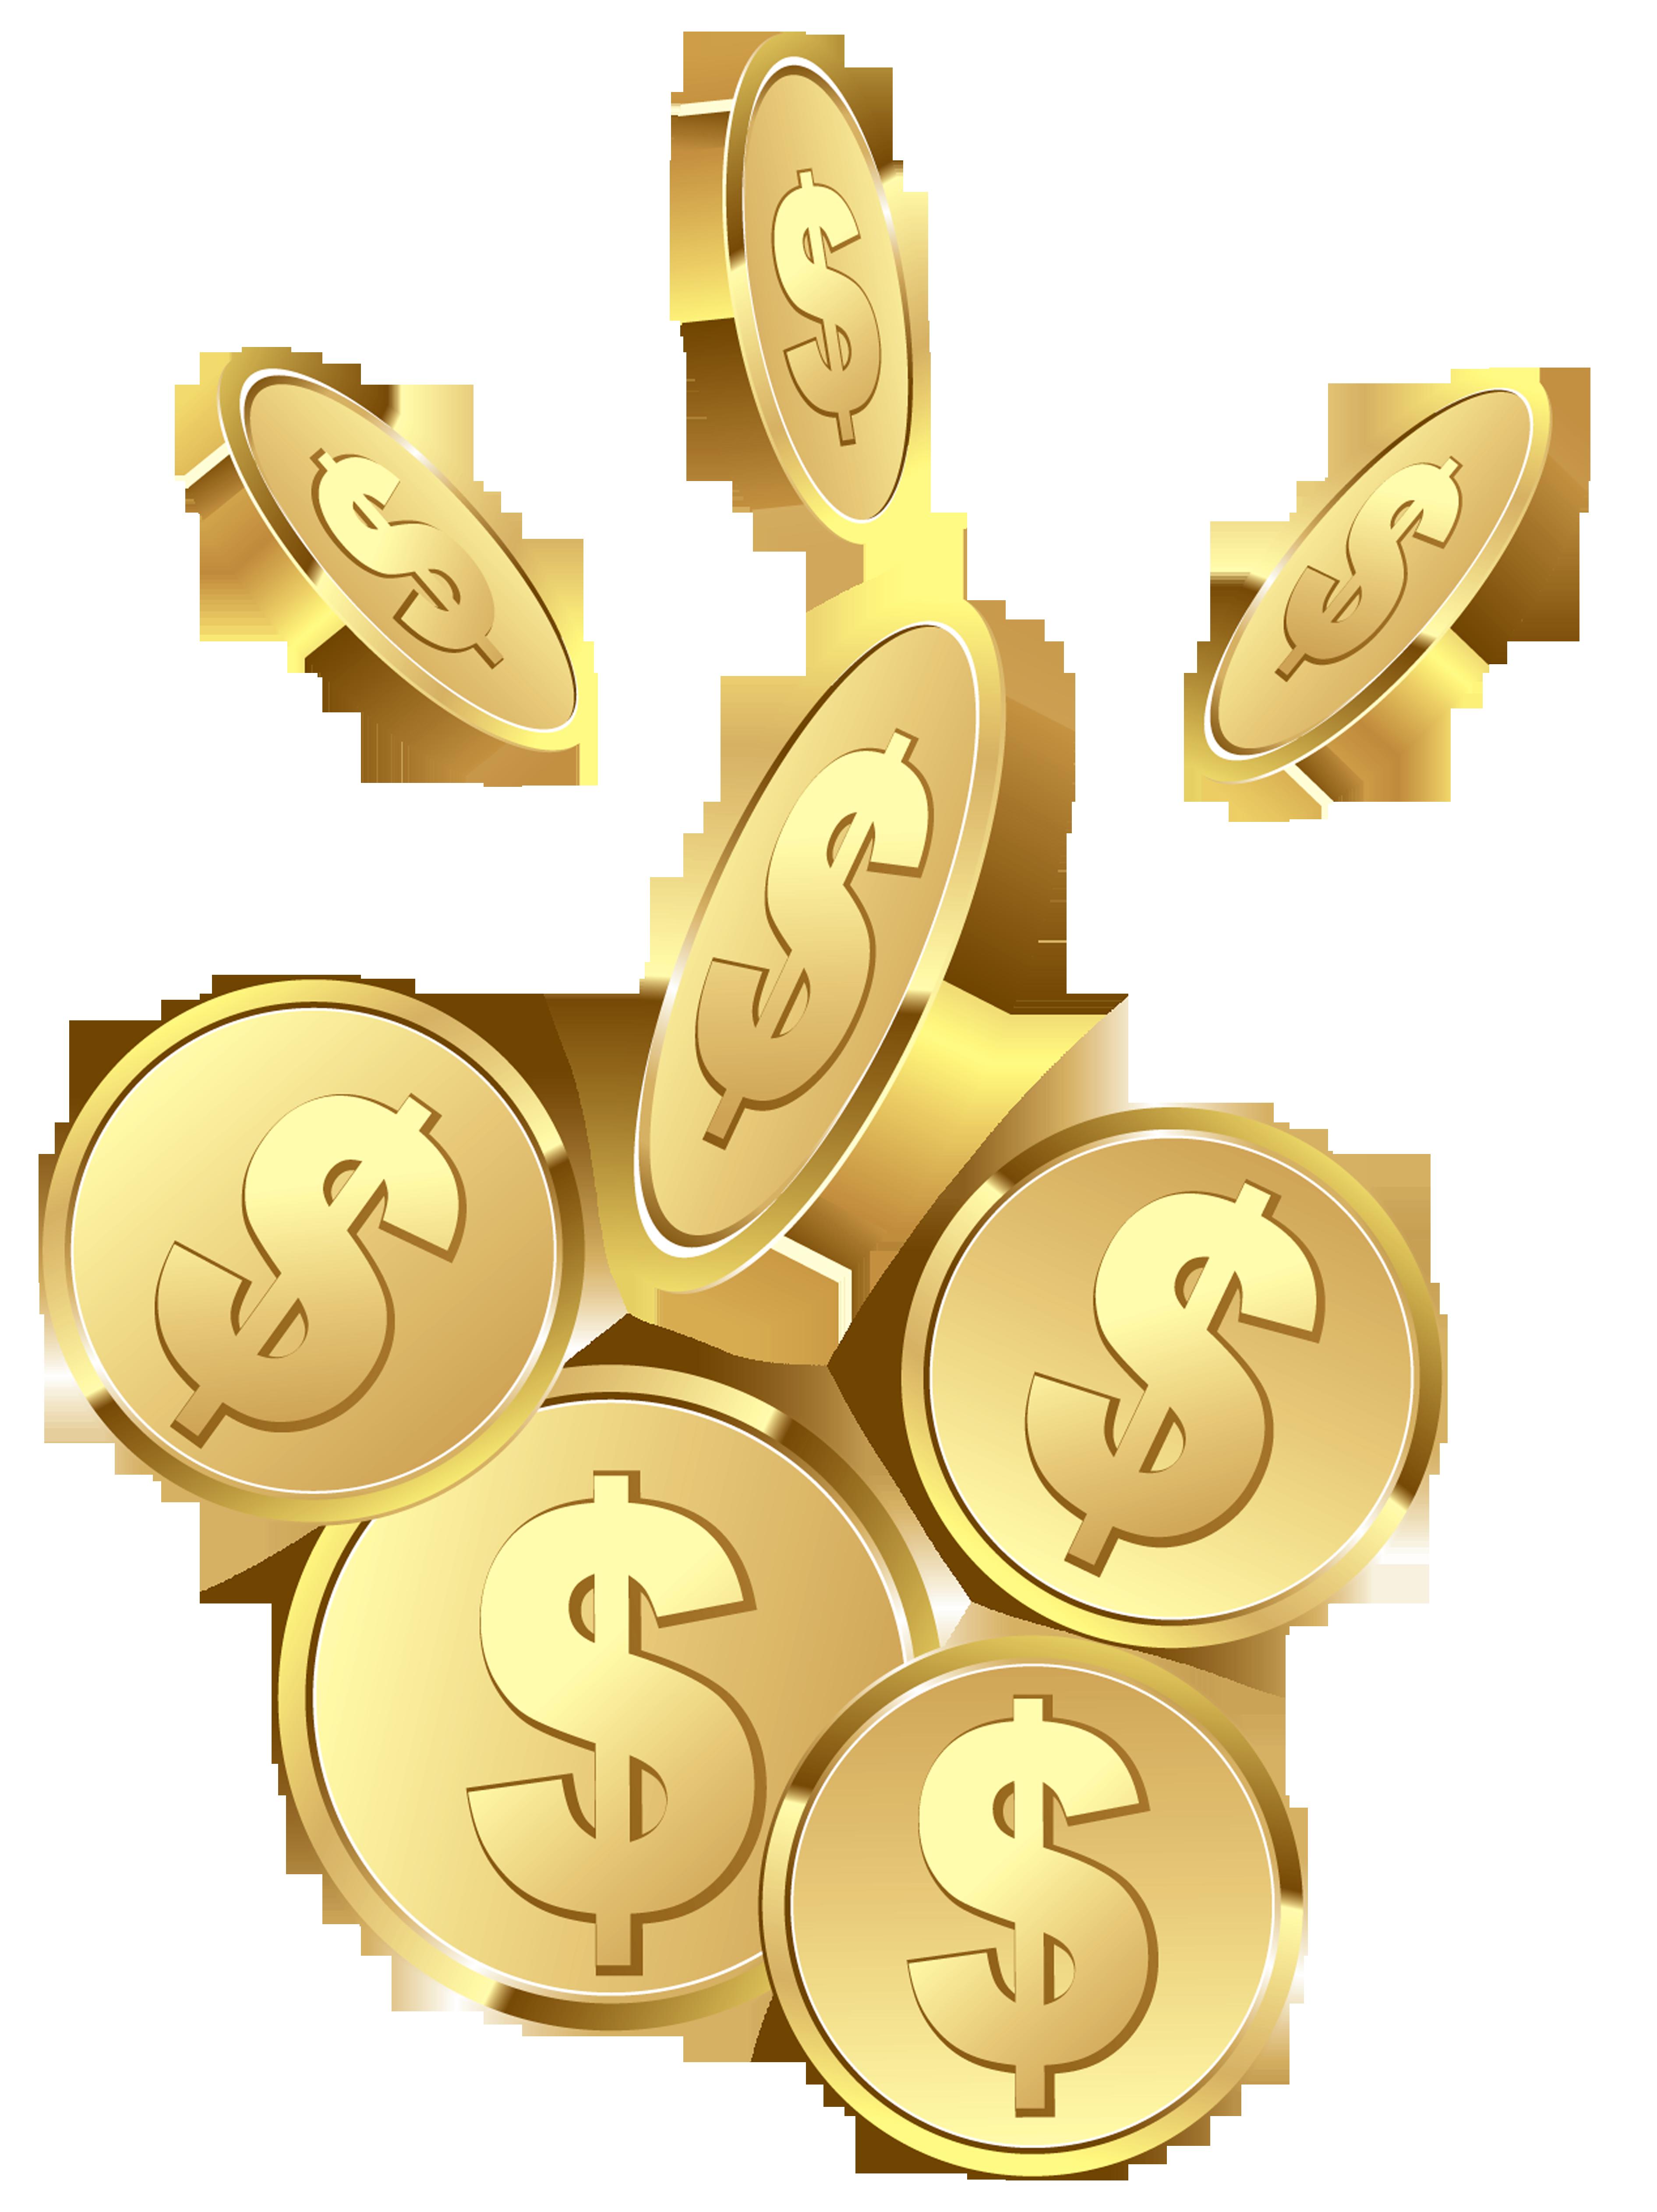 Gold Coins Gold Coins Coins Gold